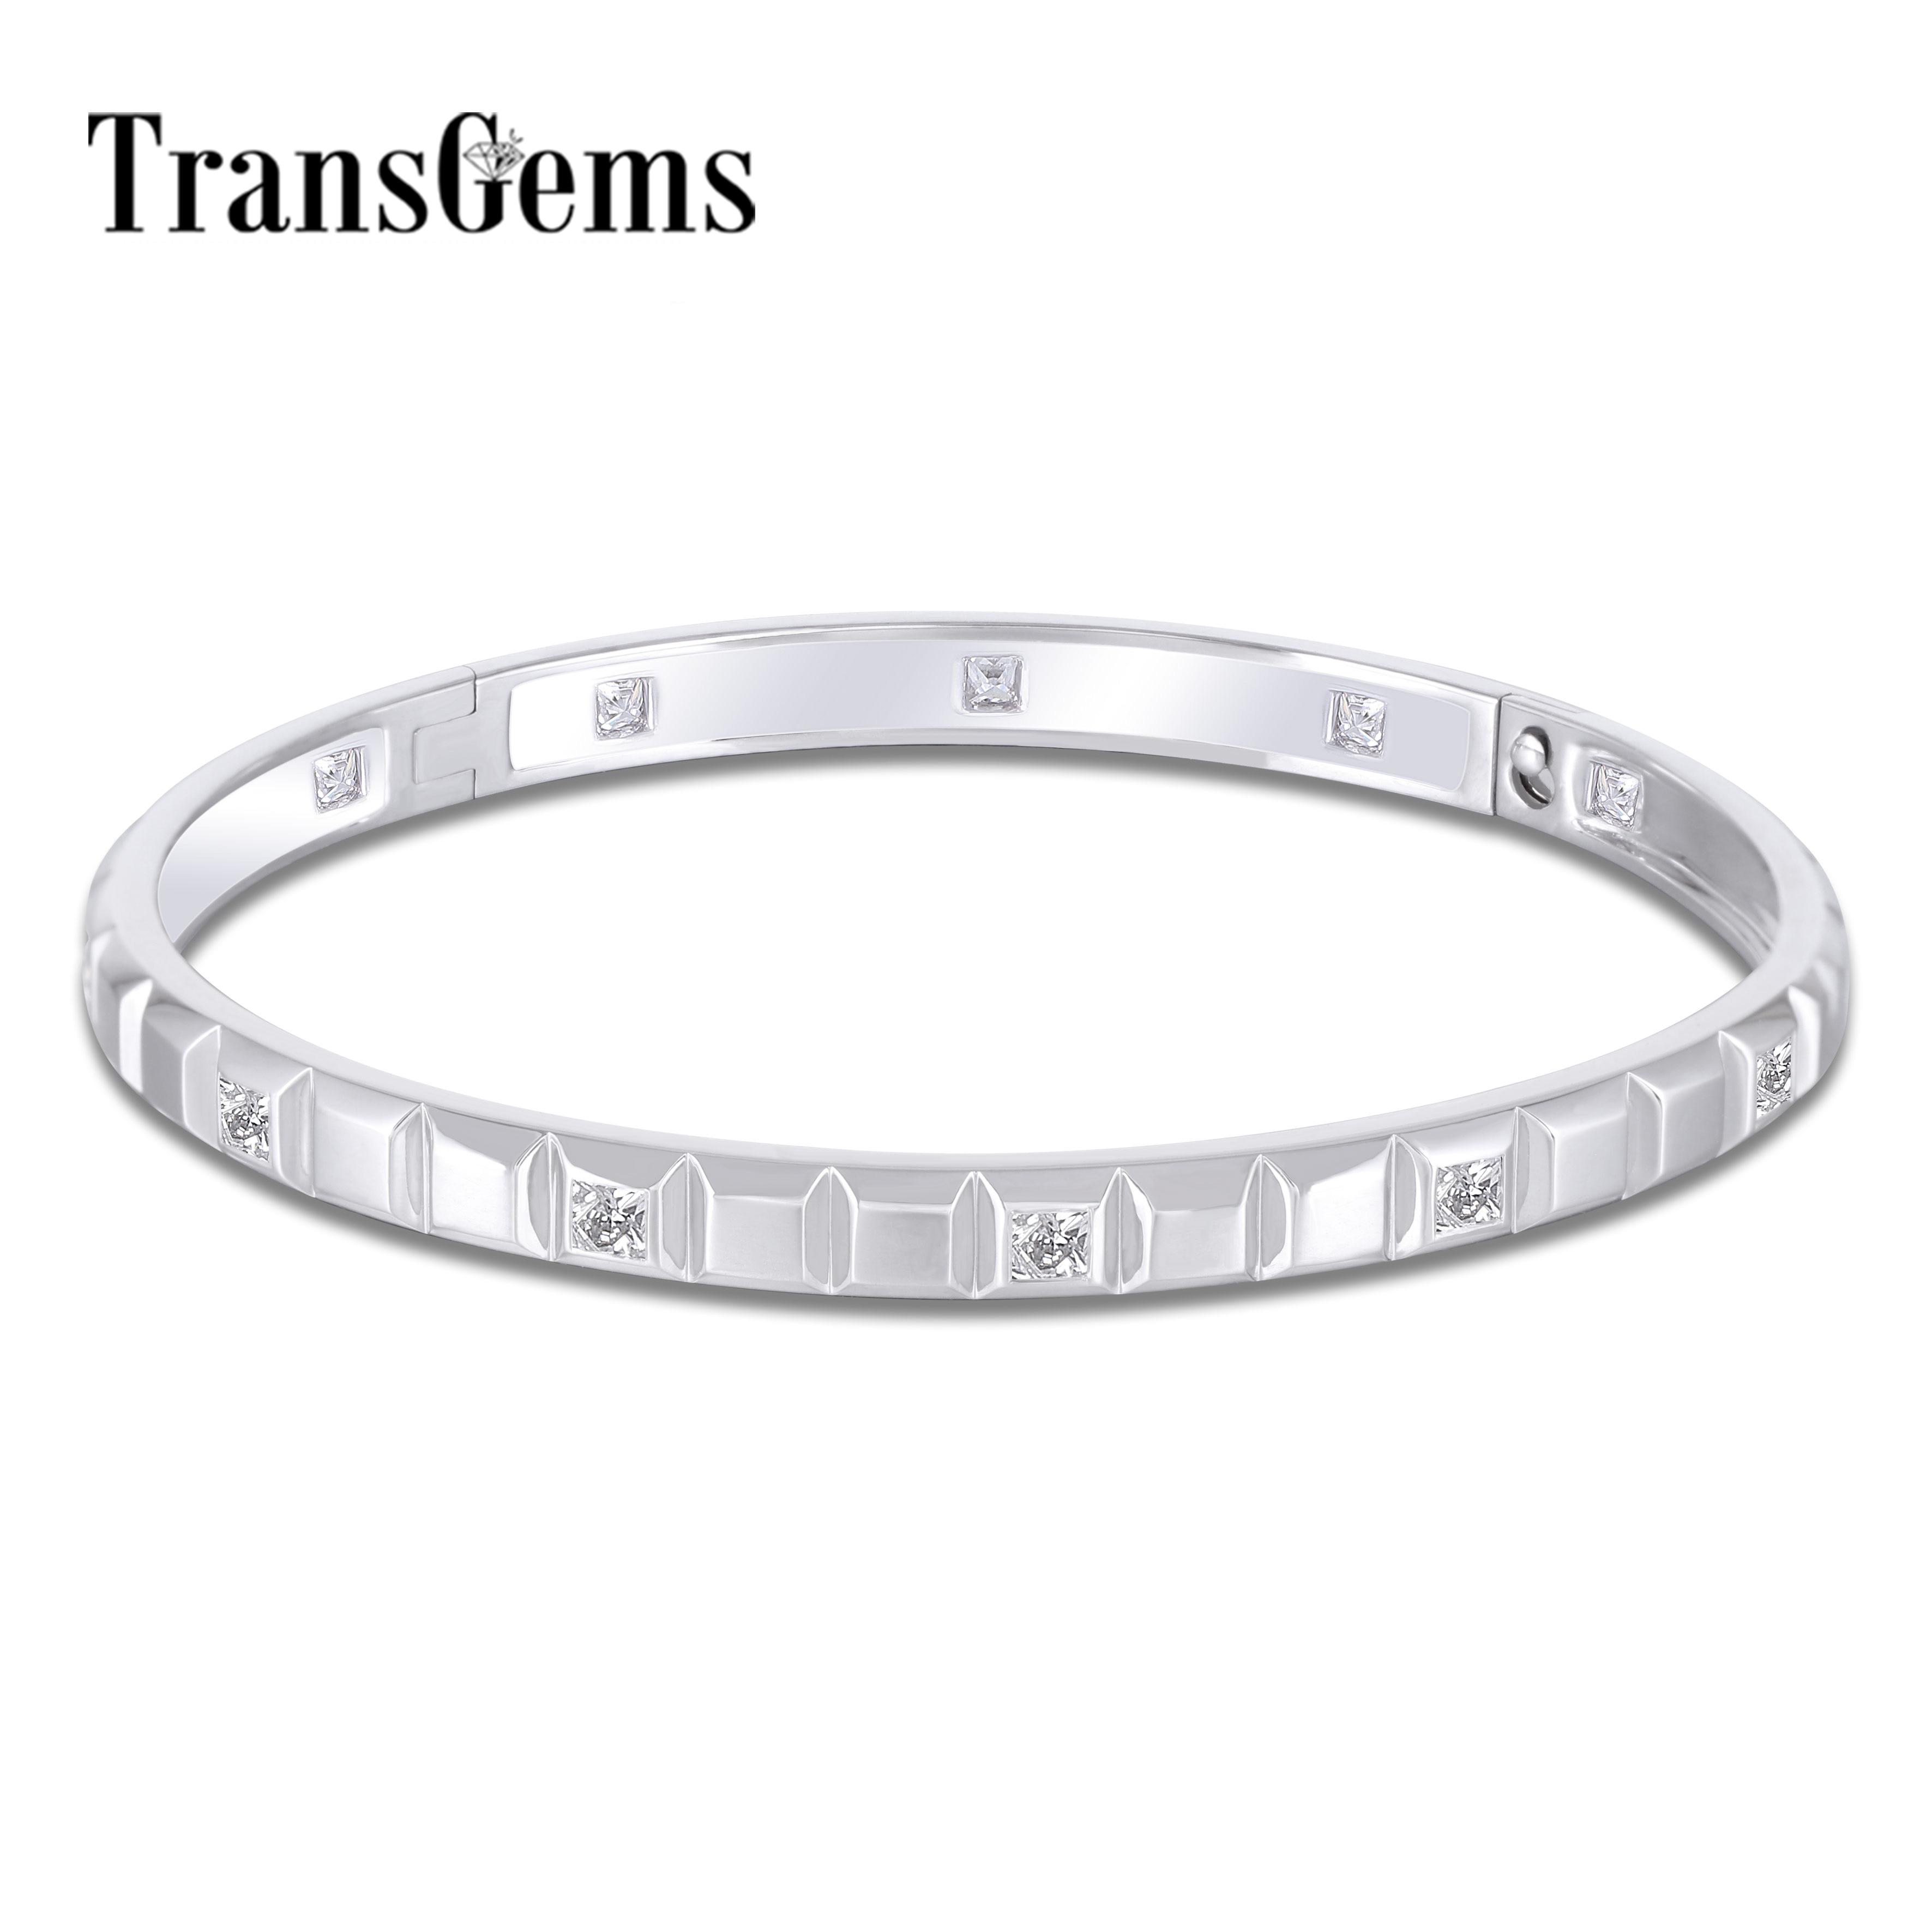 Transgems 18K White Gold 12pcs Princess cut F Color Moissanite Bangle Bracelets for Women Size 16